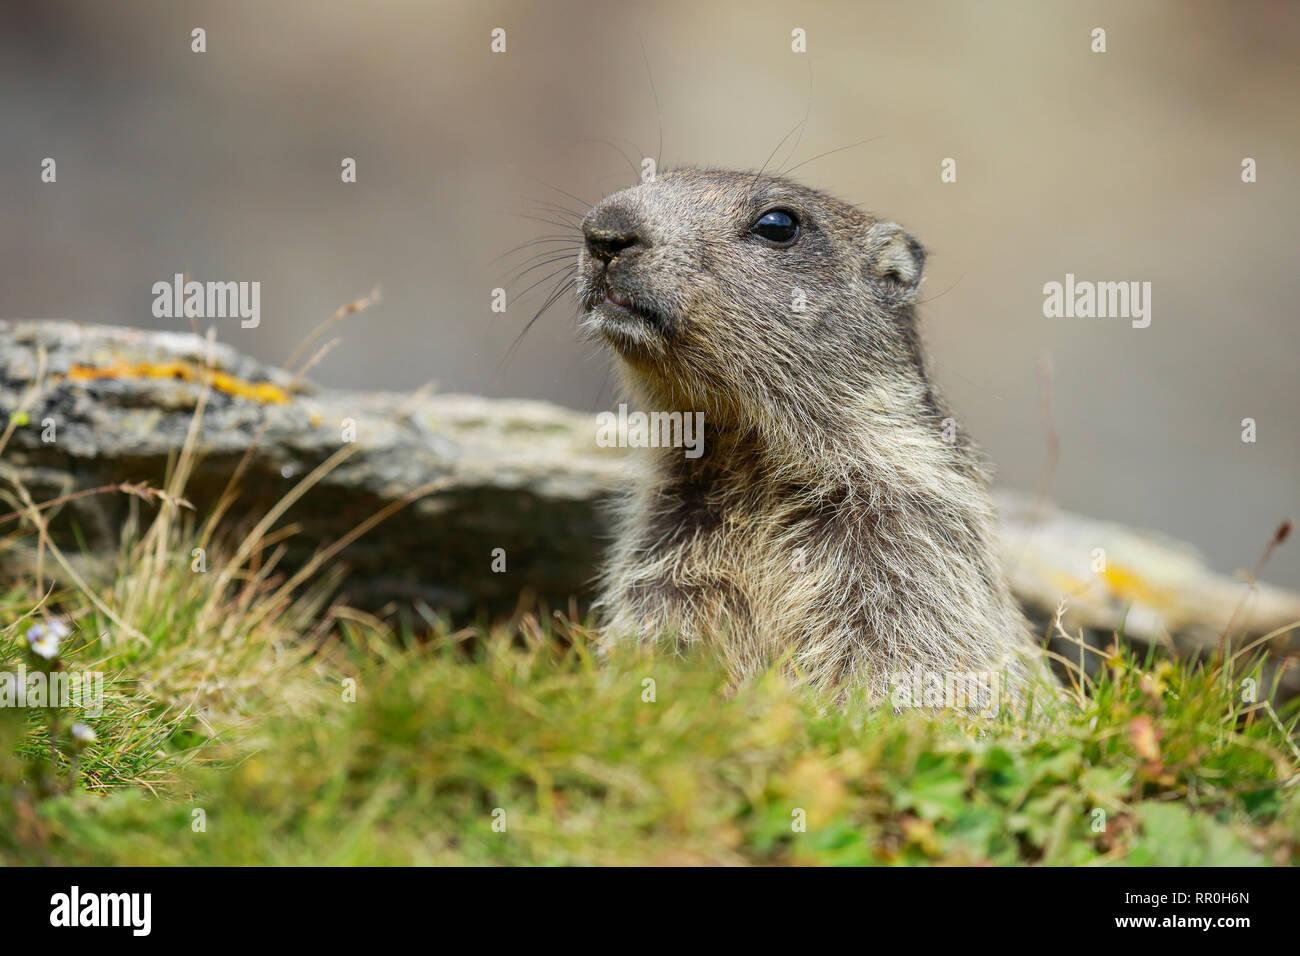 zoology, mammal (mammalia), alpine marmot (Marmota Marmota), Additional-Rights-Clearance-Info-Not-Available - Stock Image